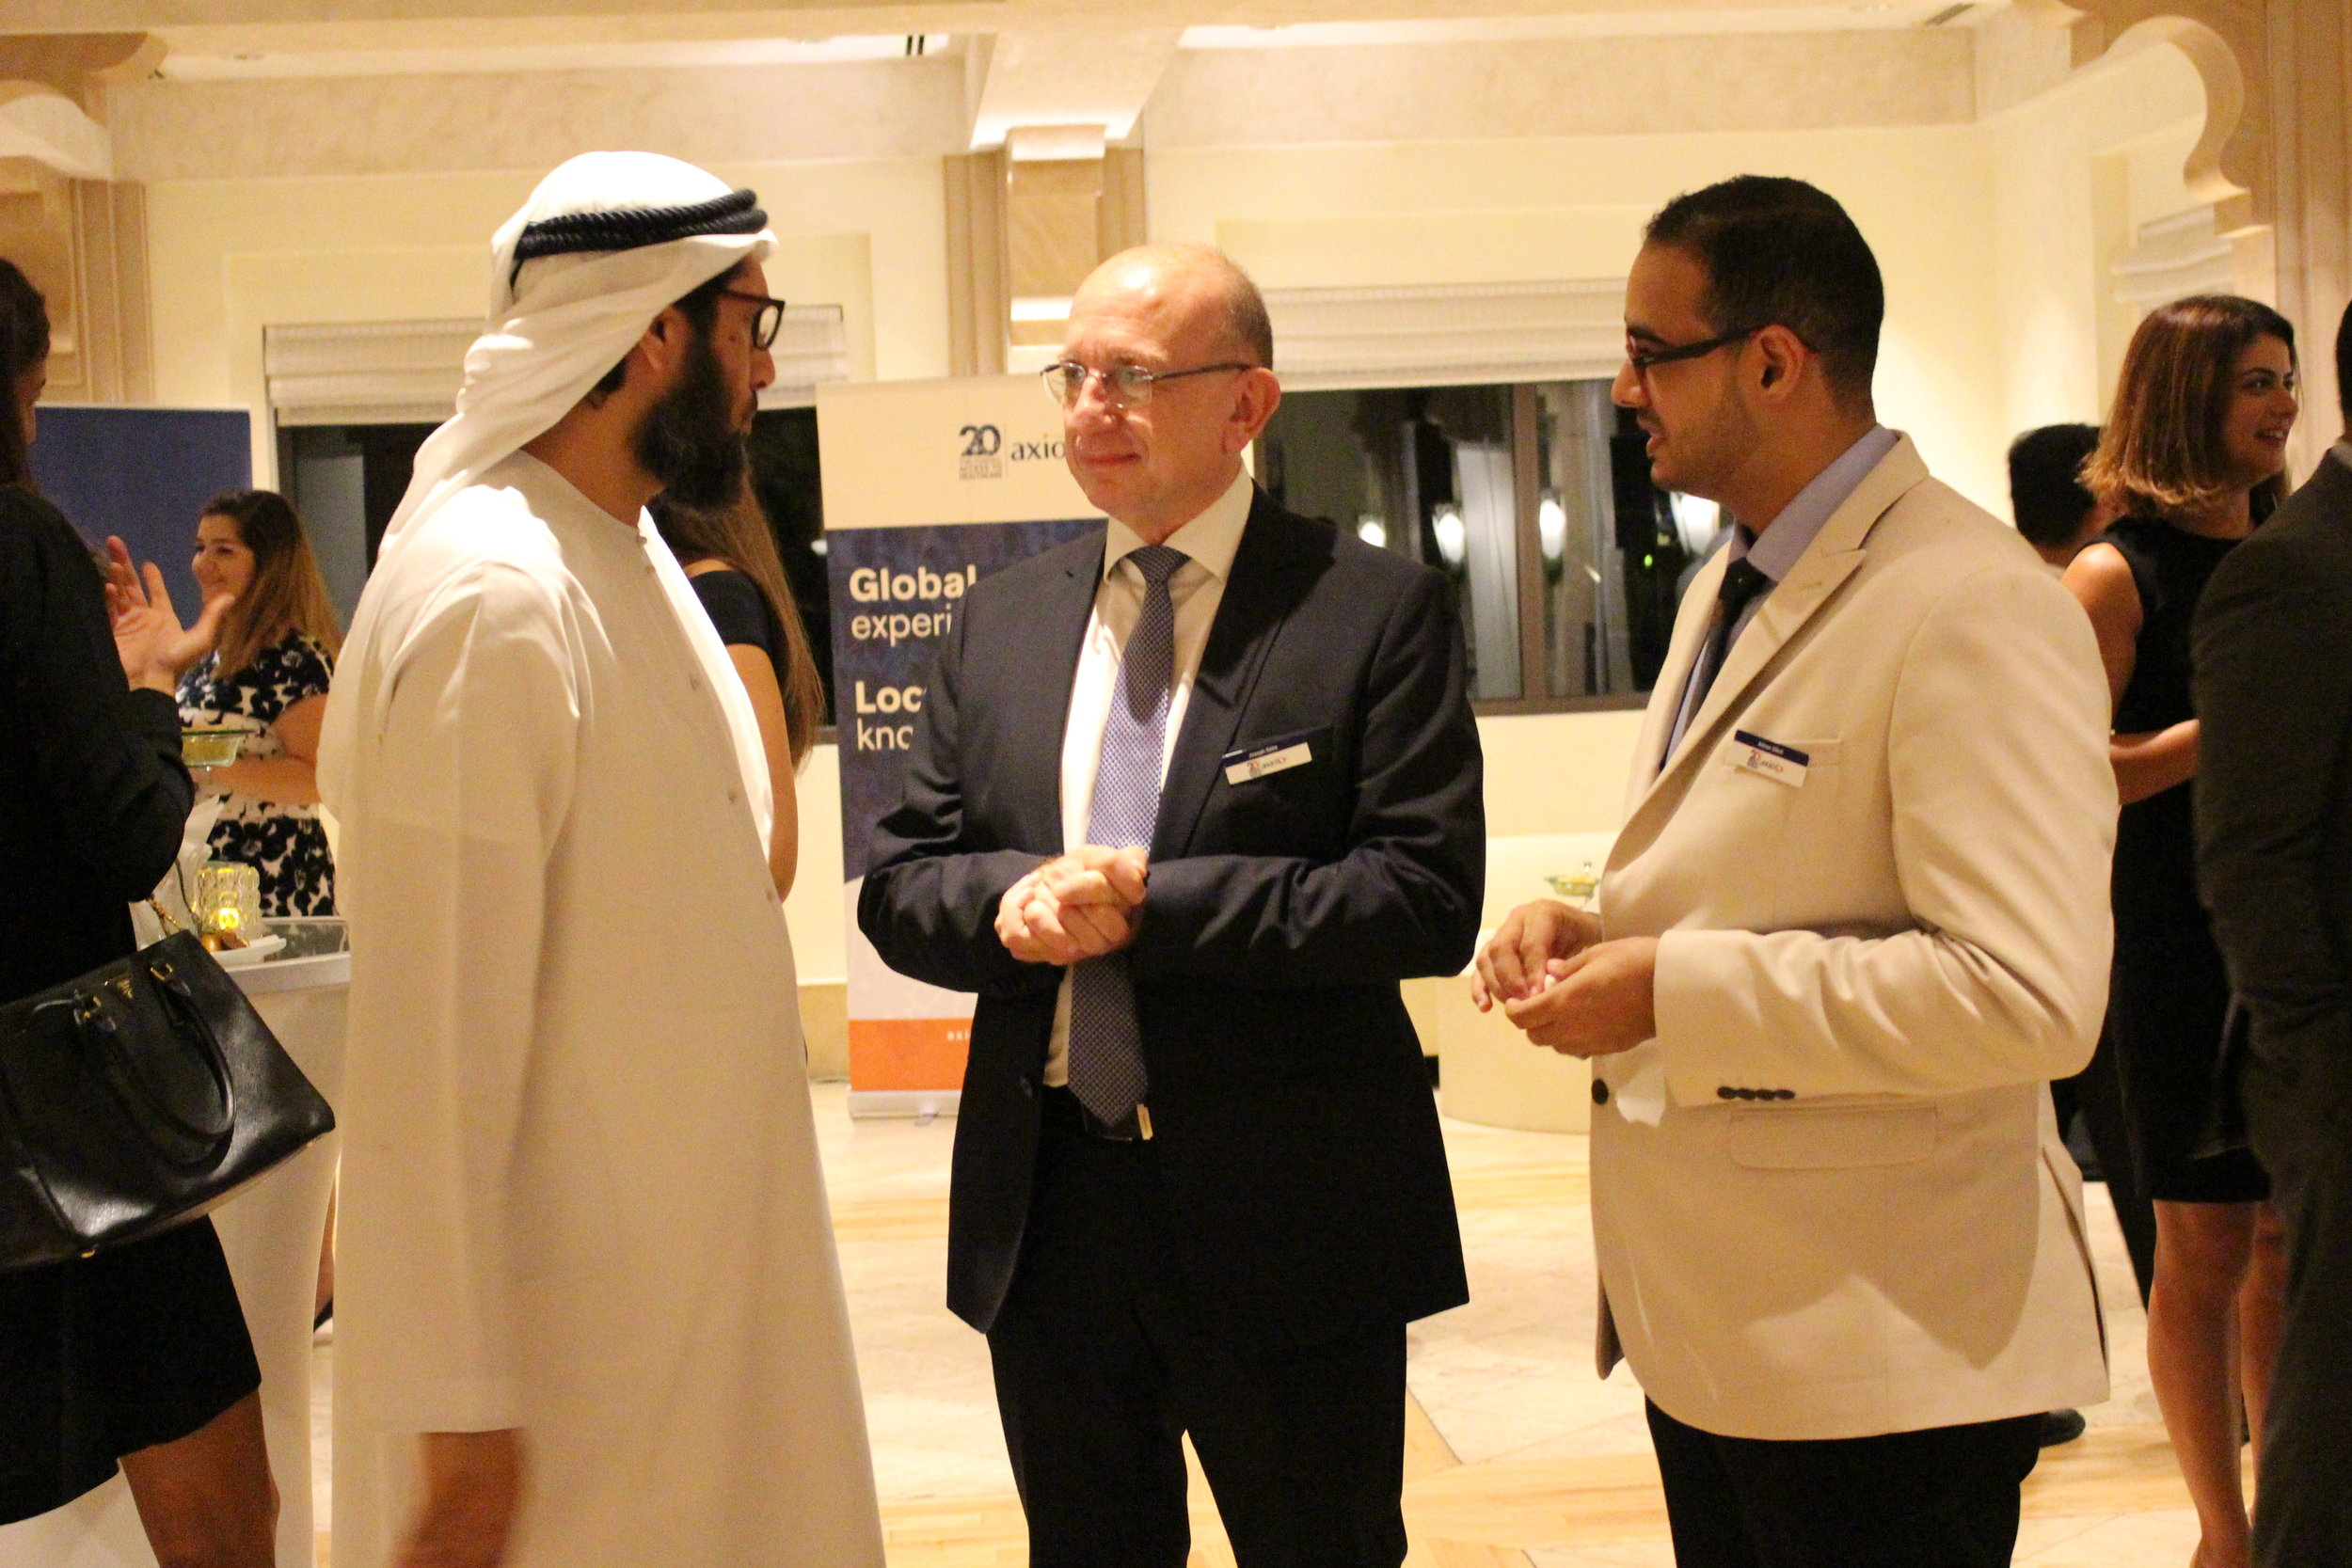 Dr. Joseph Saba and Dubai-based Program Assistant Adnan Elkot speaks with Salim bin Lahej, Dubai Health Authority's Director of Community and Humanitarian Services